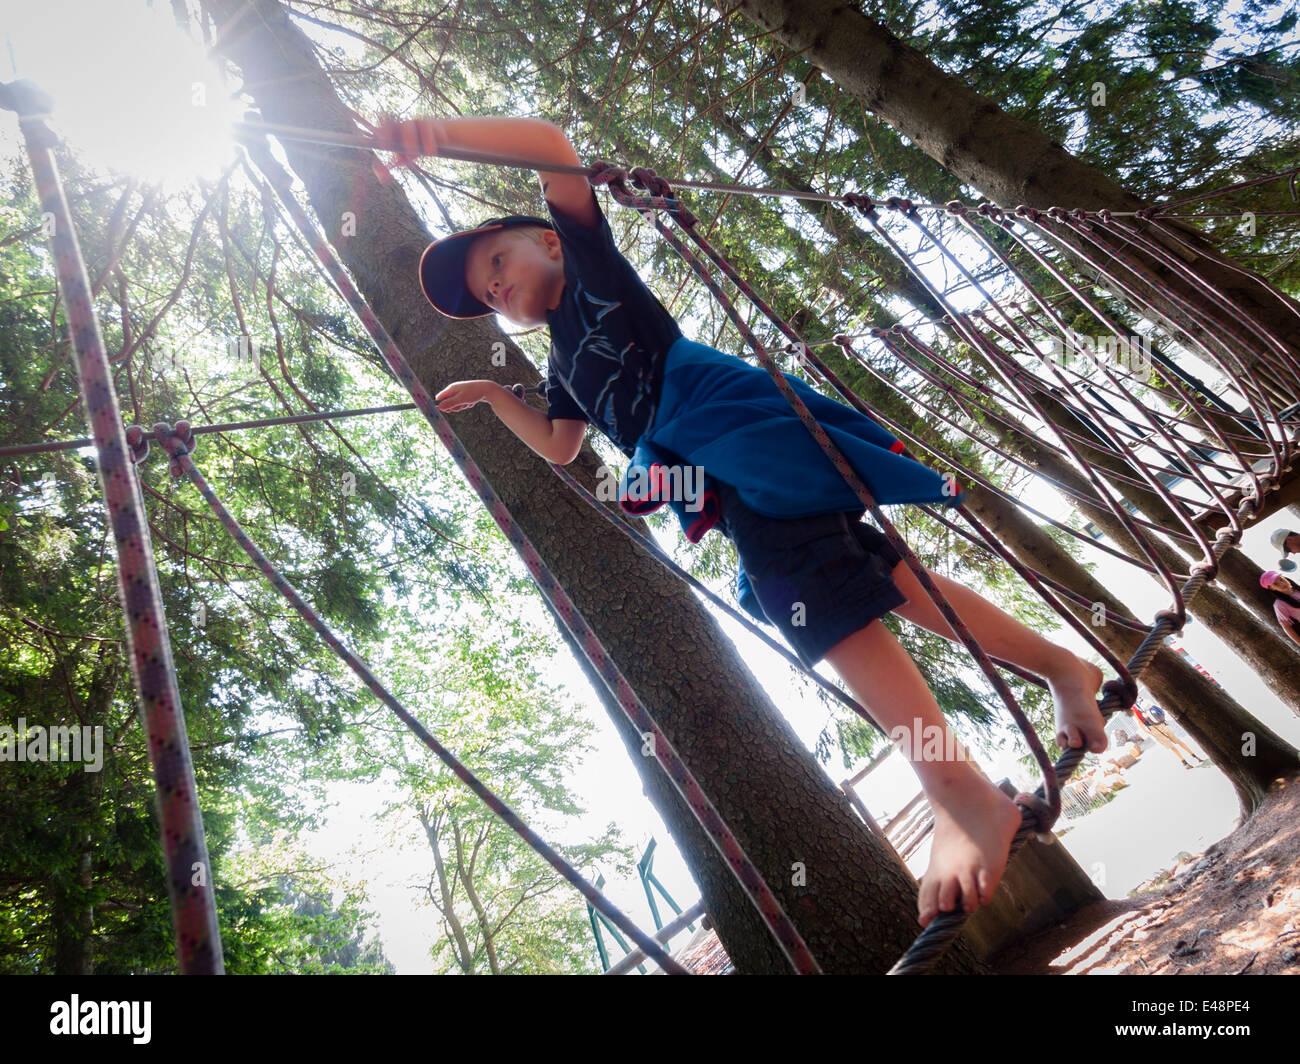 Klettergerüst Aus Seilen : Klettergerüst seilspielgerät kletternetz klettergerät